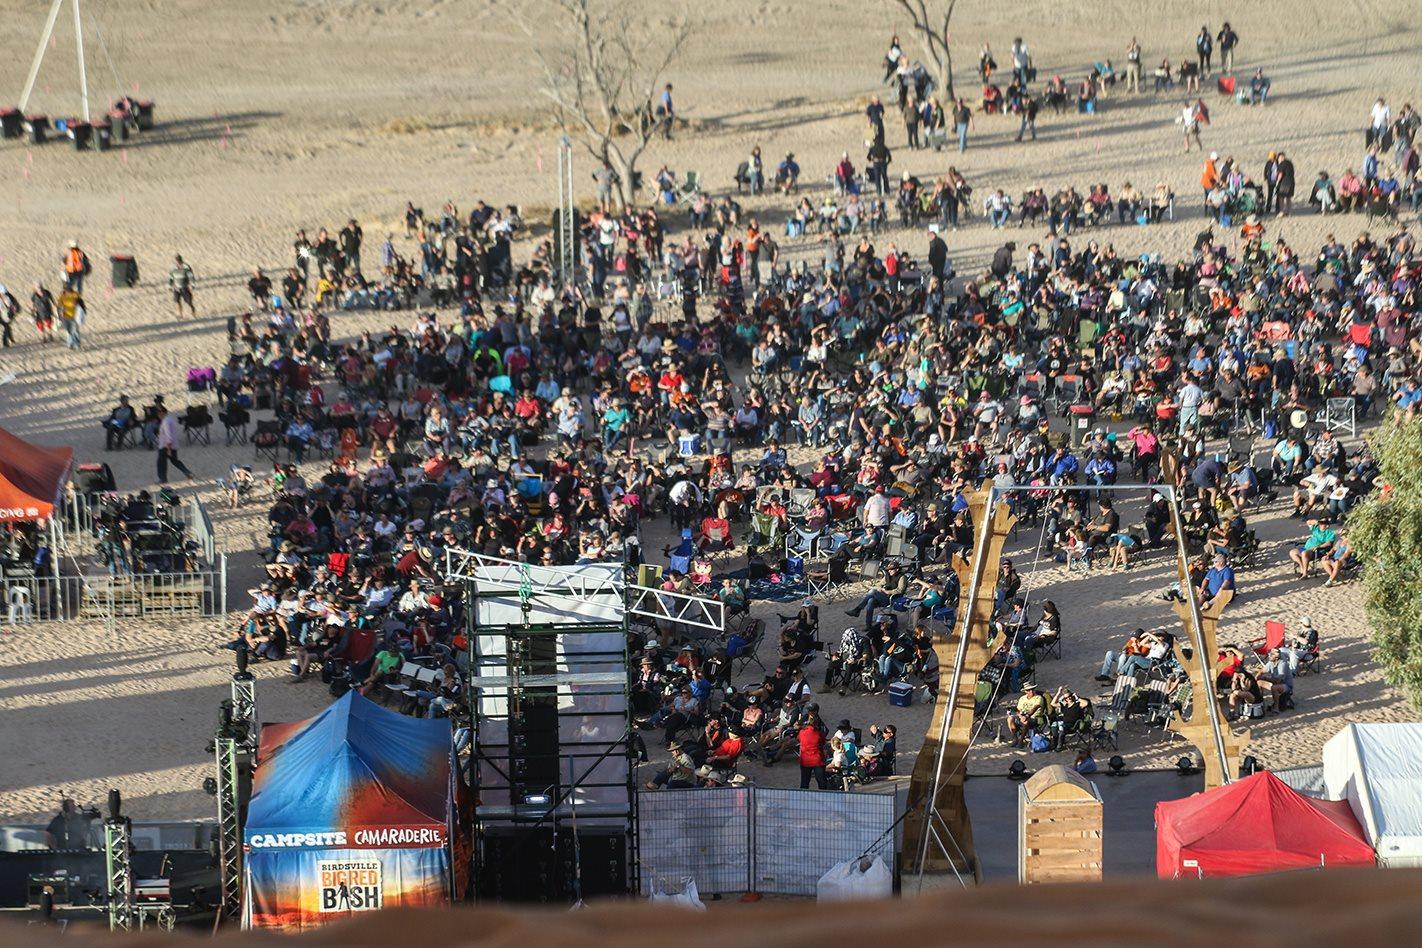 2017 Big Red Bash aerial crowd.jpg